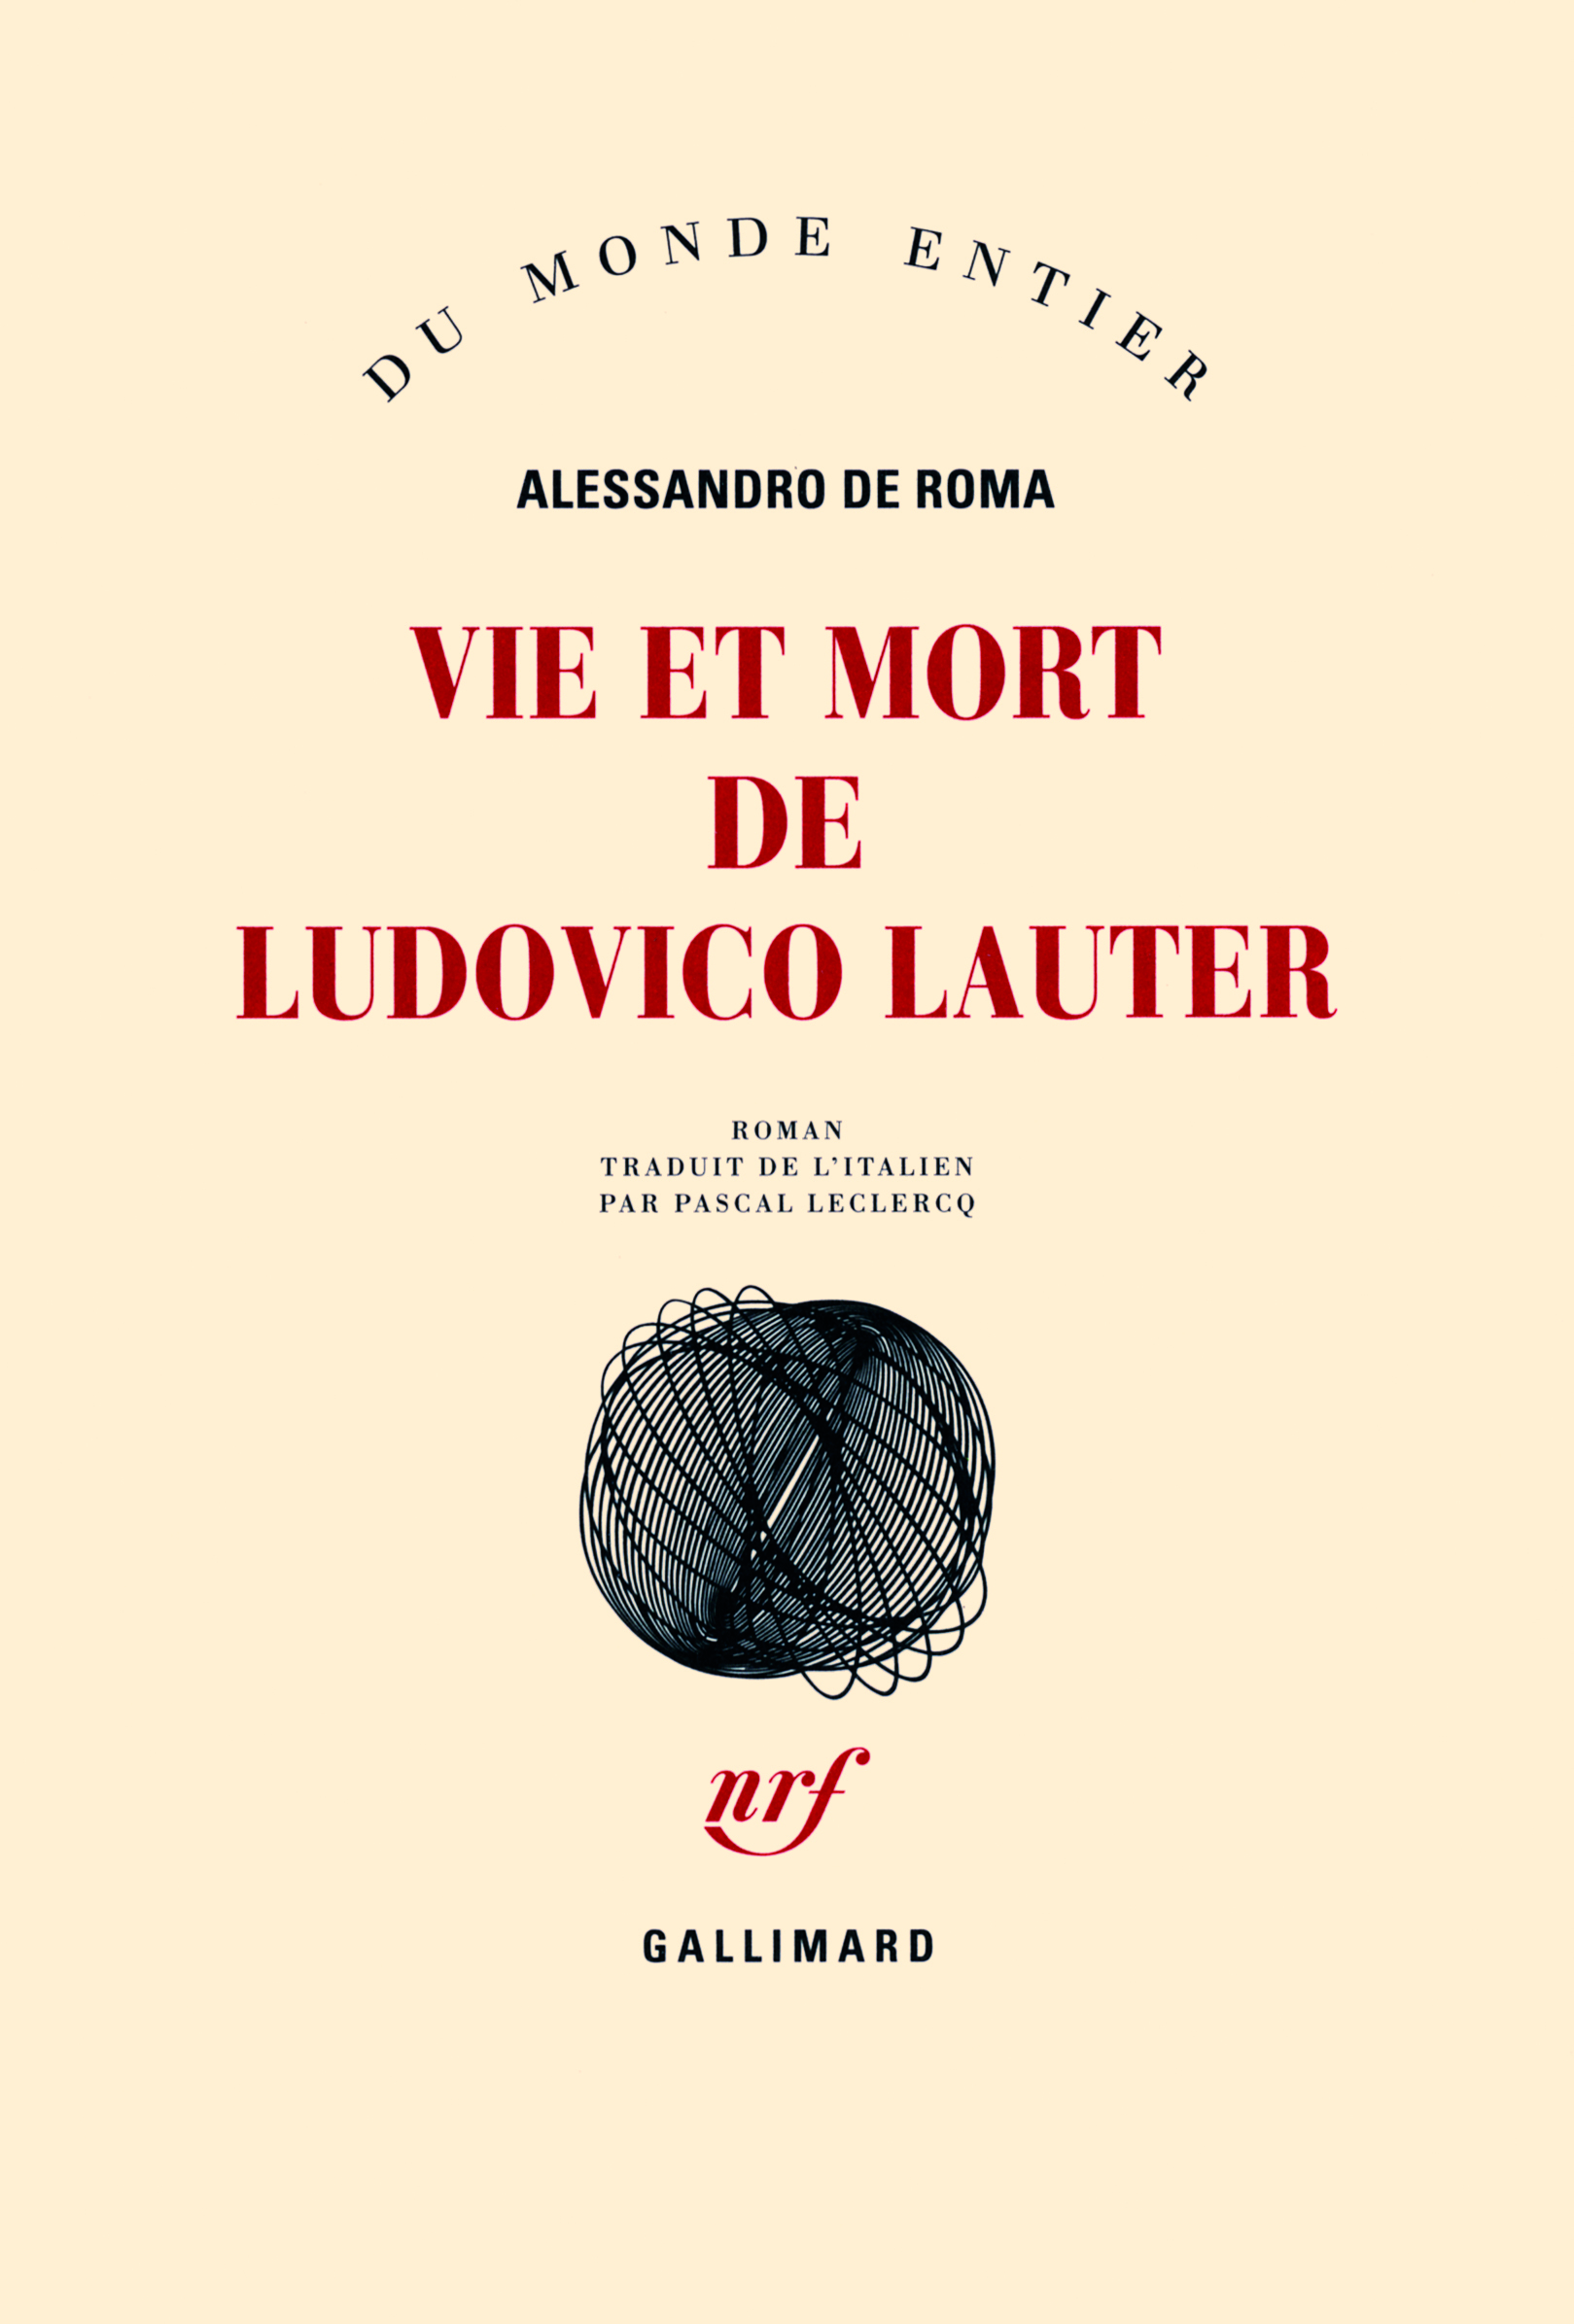 VIE ET MORT DE LUDOVICO LAUTER ROMAN